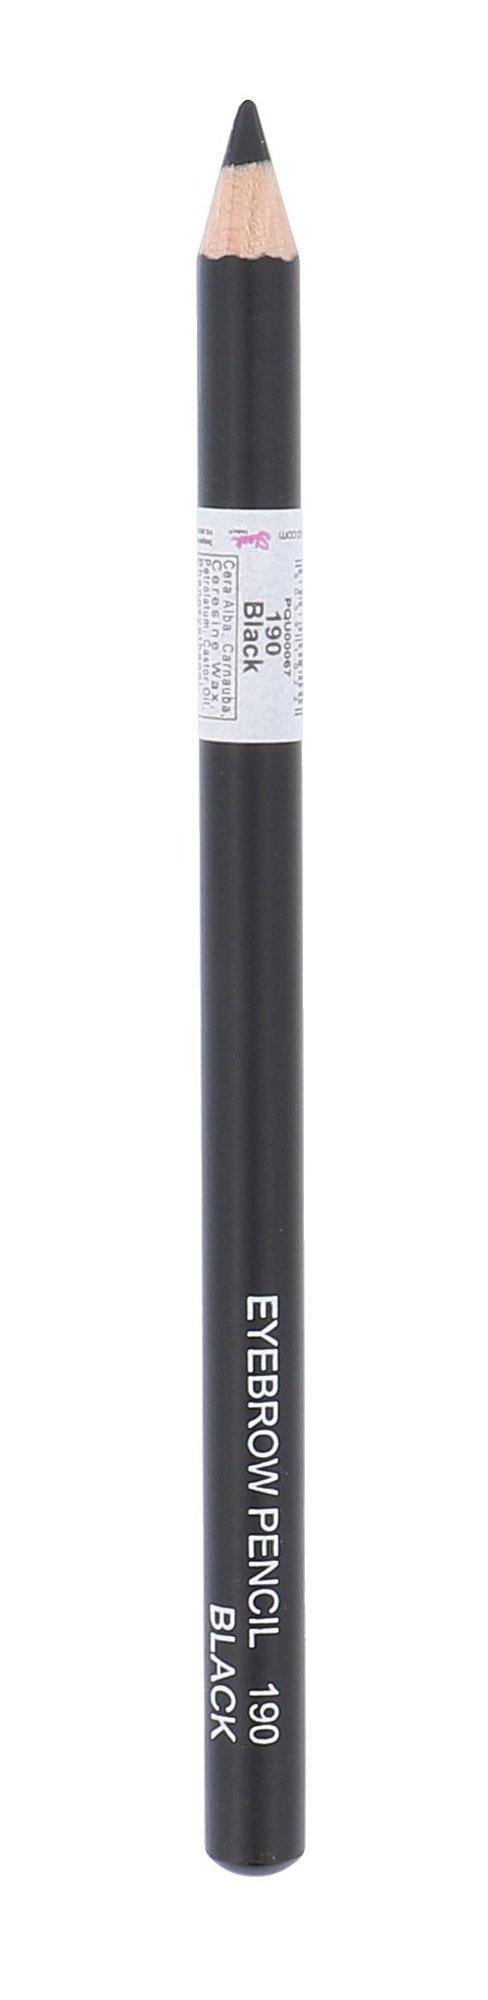 Sleek MakeUP Eyebrow Pencil Cosmetic 1,66ml 190 Black